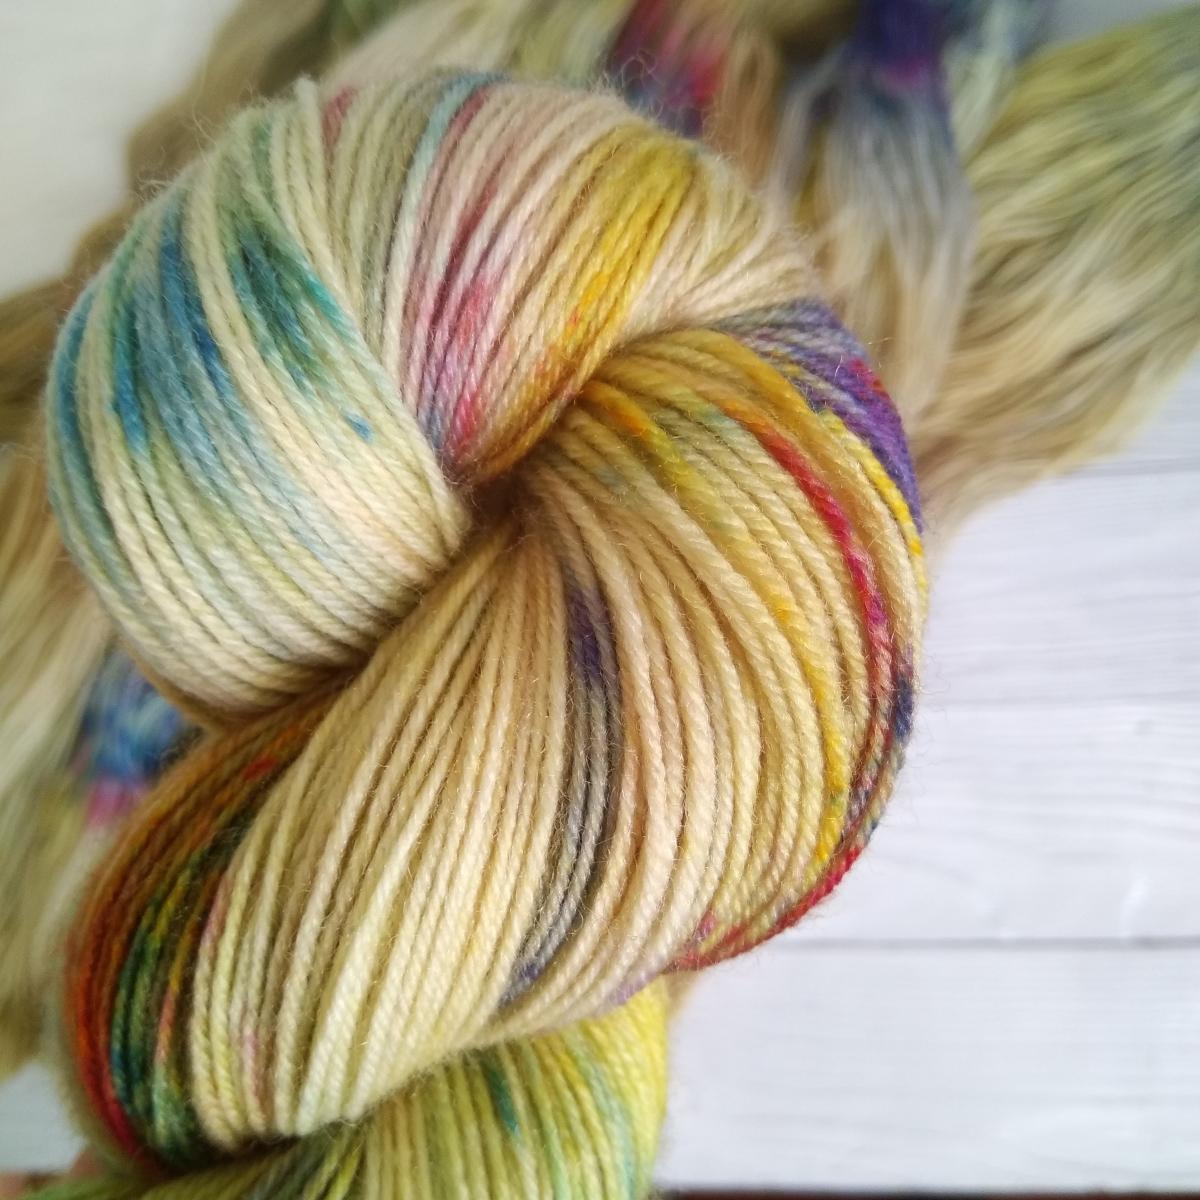 woodico.pro hand dyed yarn 032 1200x1200 - Hand dyed yarn / 032